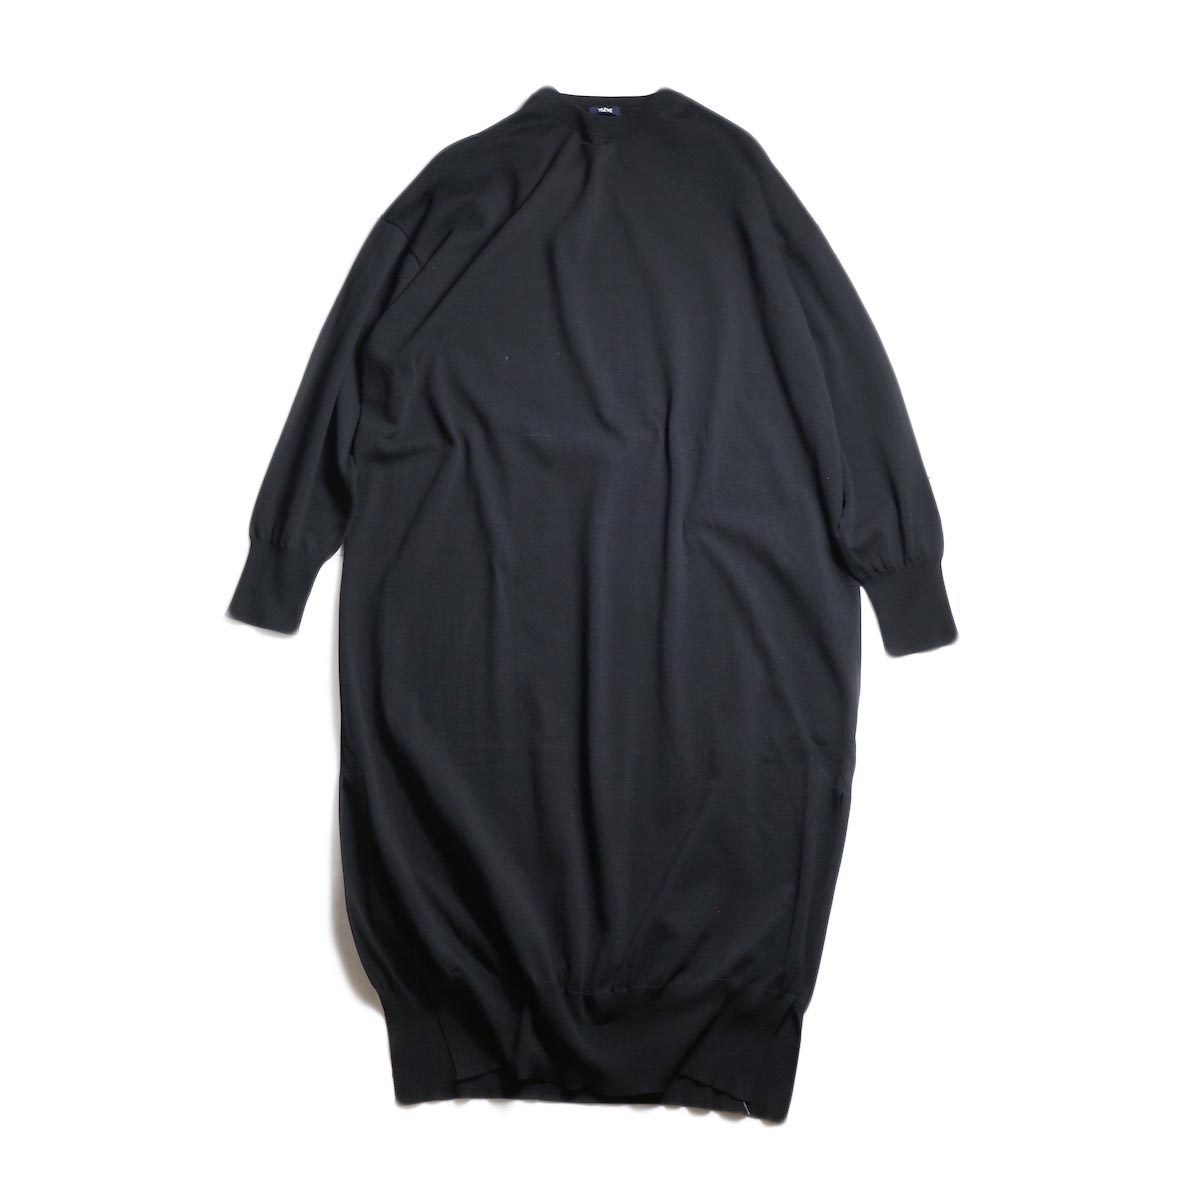 YLEVE / FINE COTTON KN OP (Black)